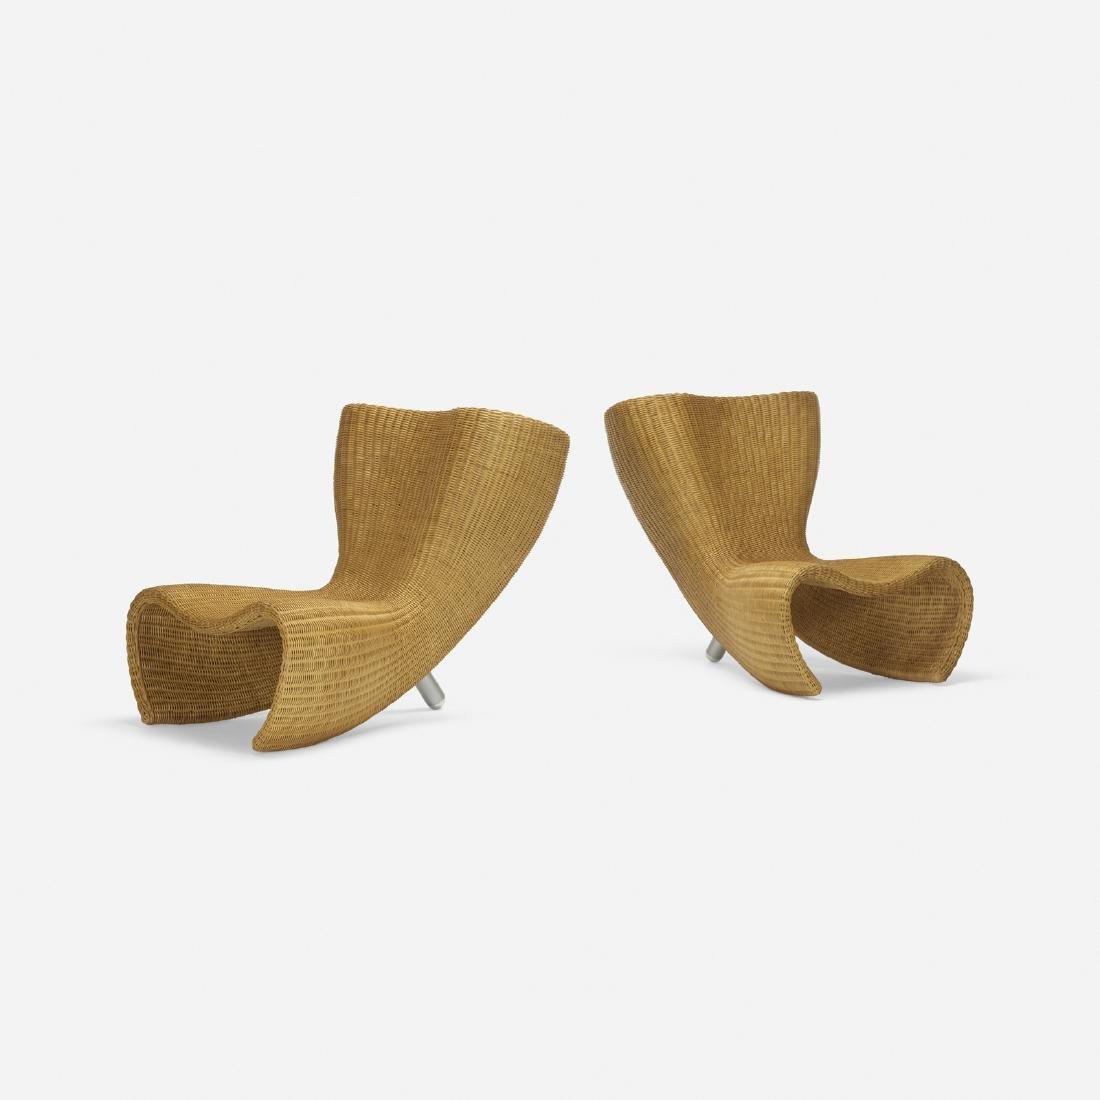 Marc Newson, Wicker chairs, pair